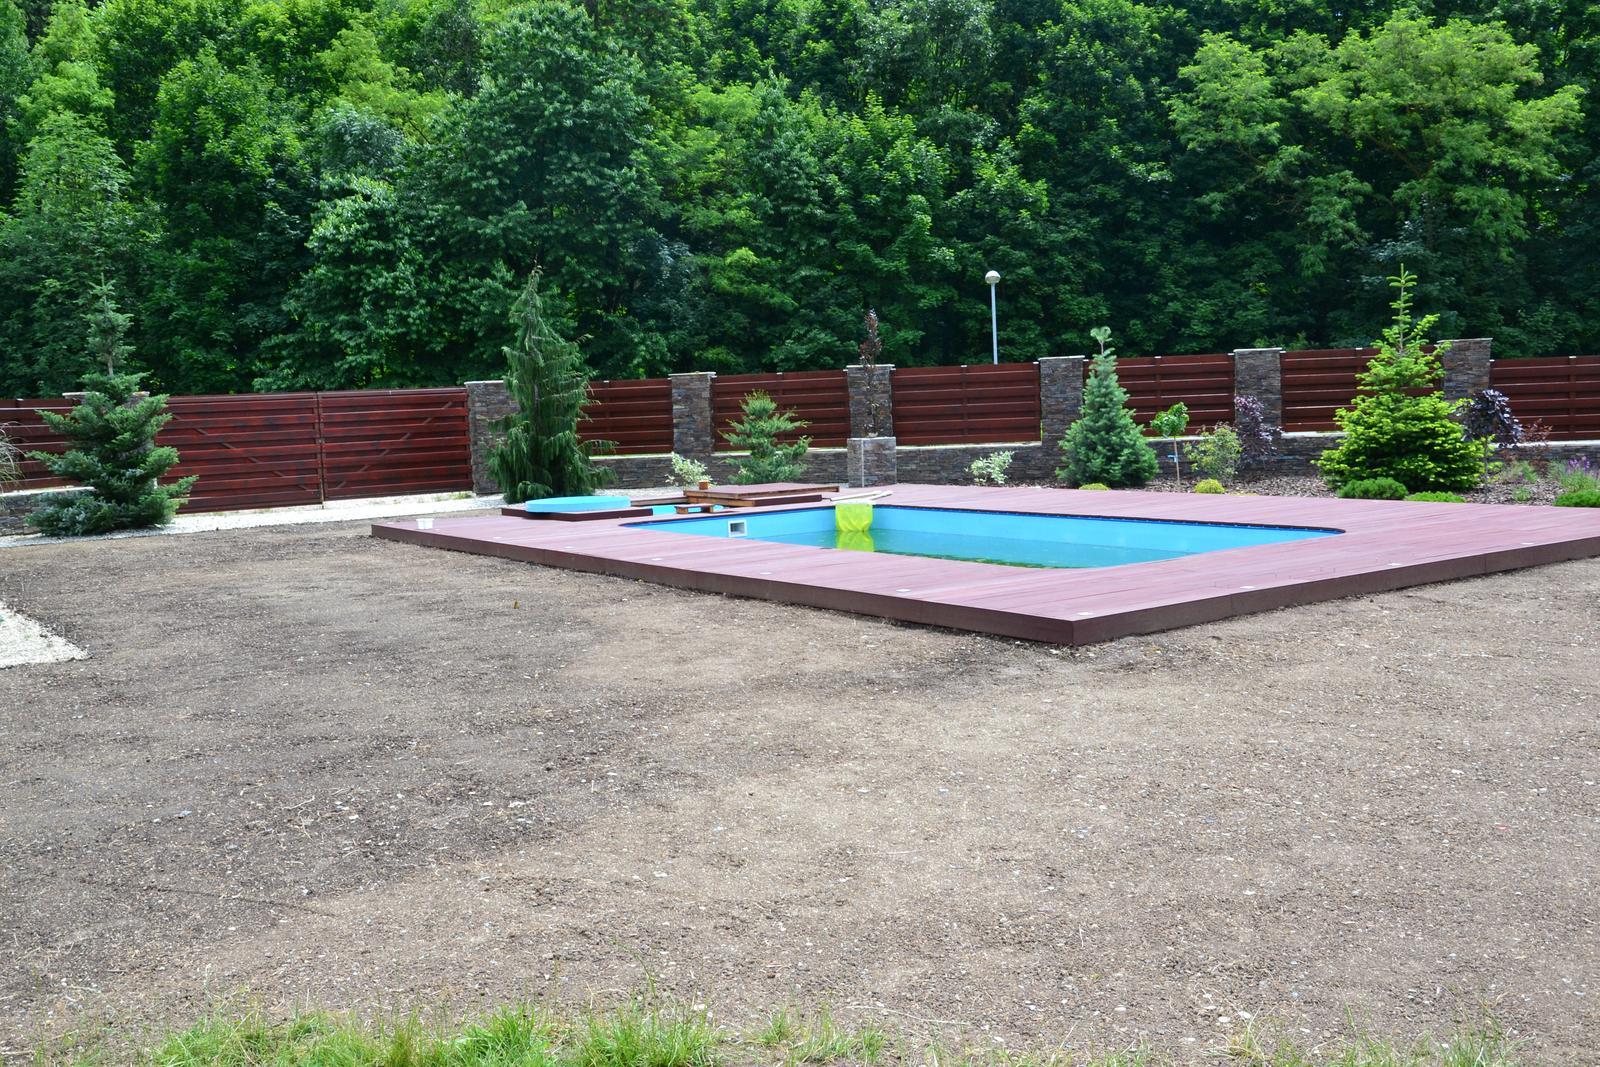 Zahrada - Obrázek č. 99